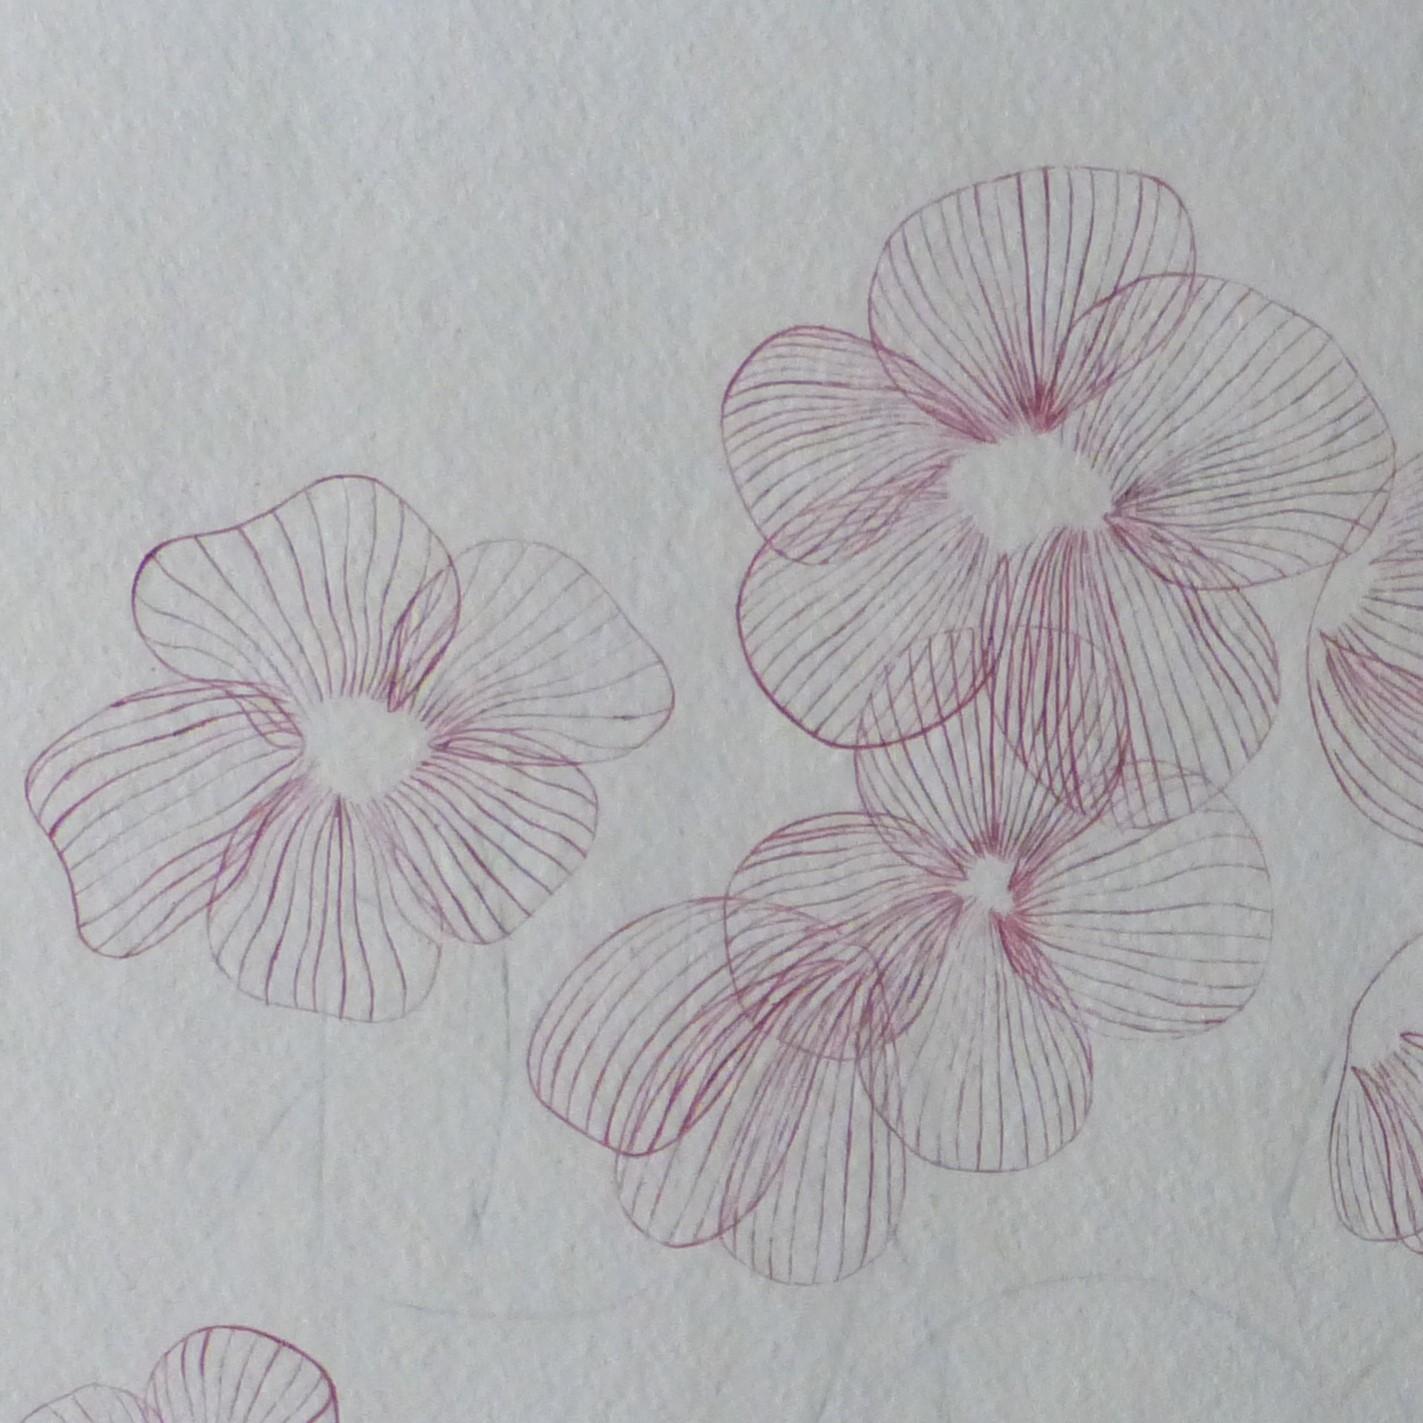 flowers ii, edit i 012119, detail (2)